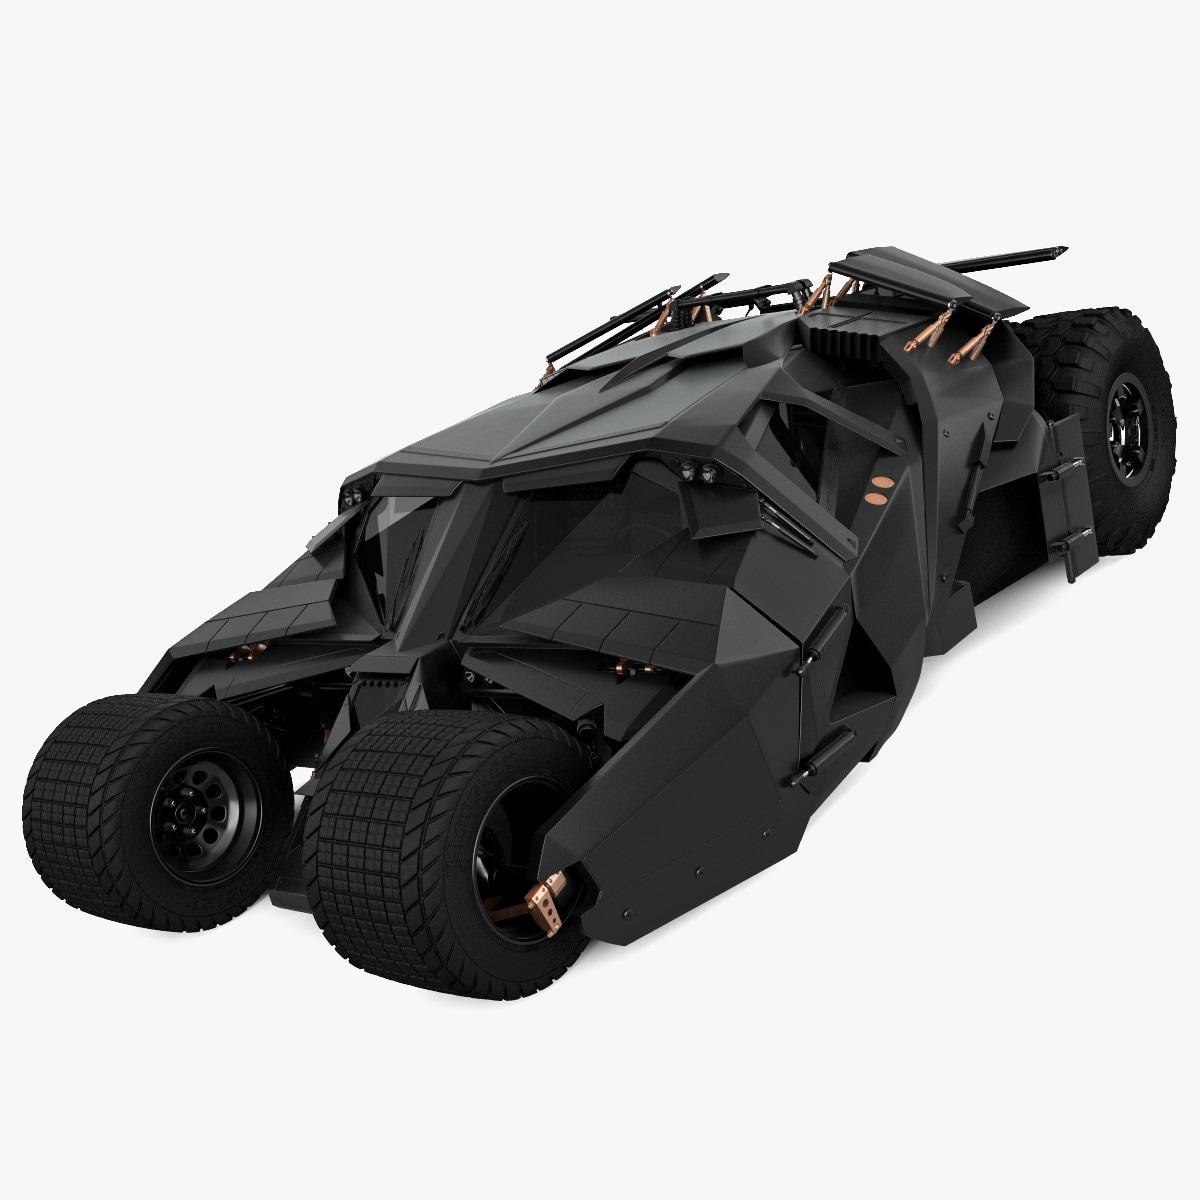 Batmobile_Tumbler_0_1.jpg